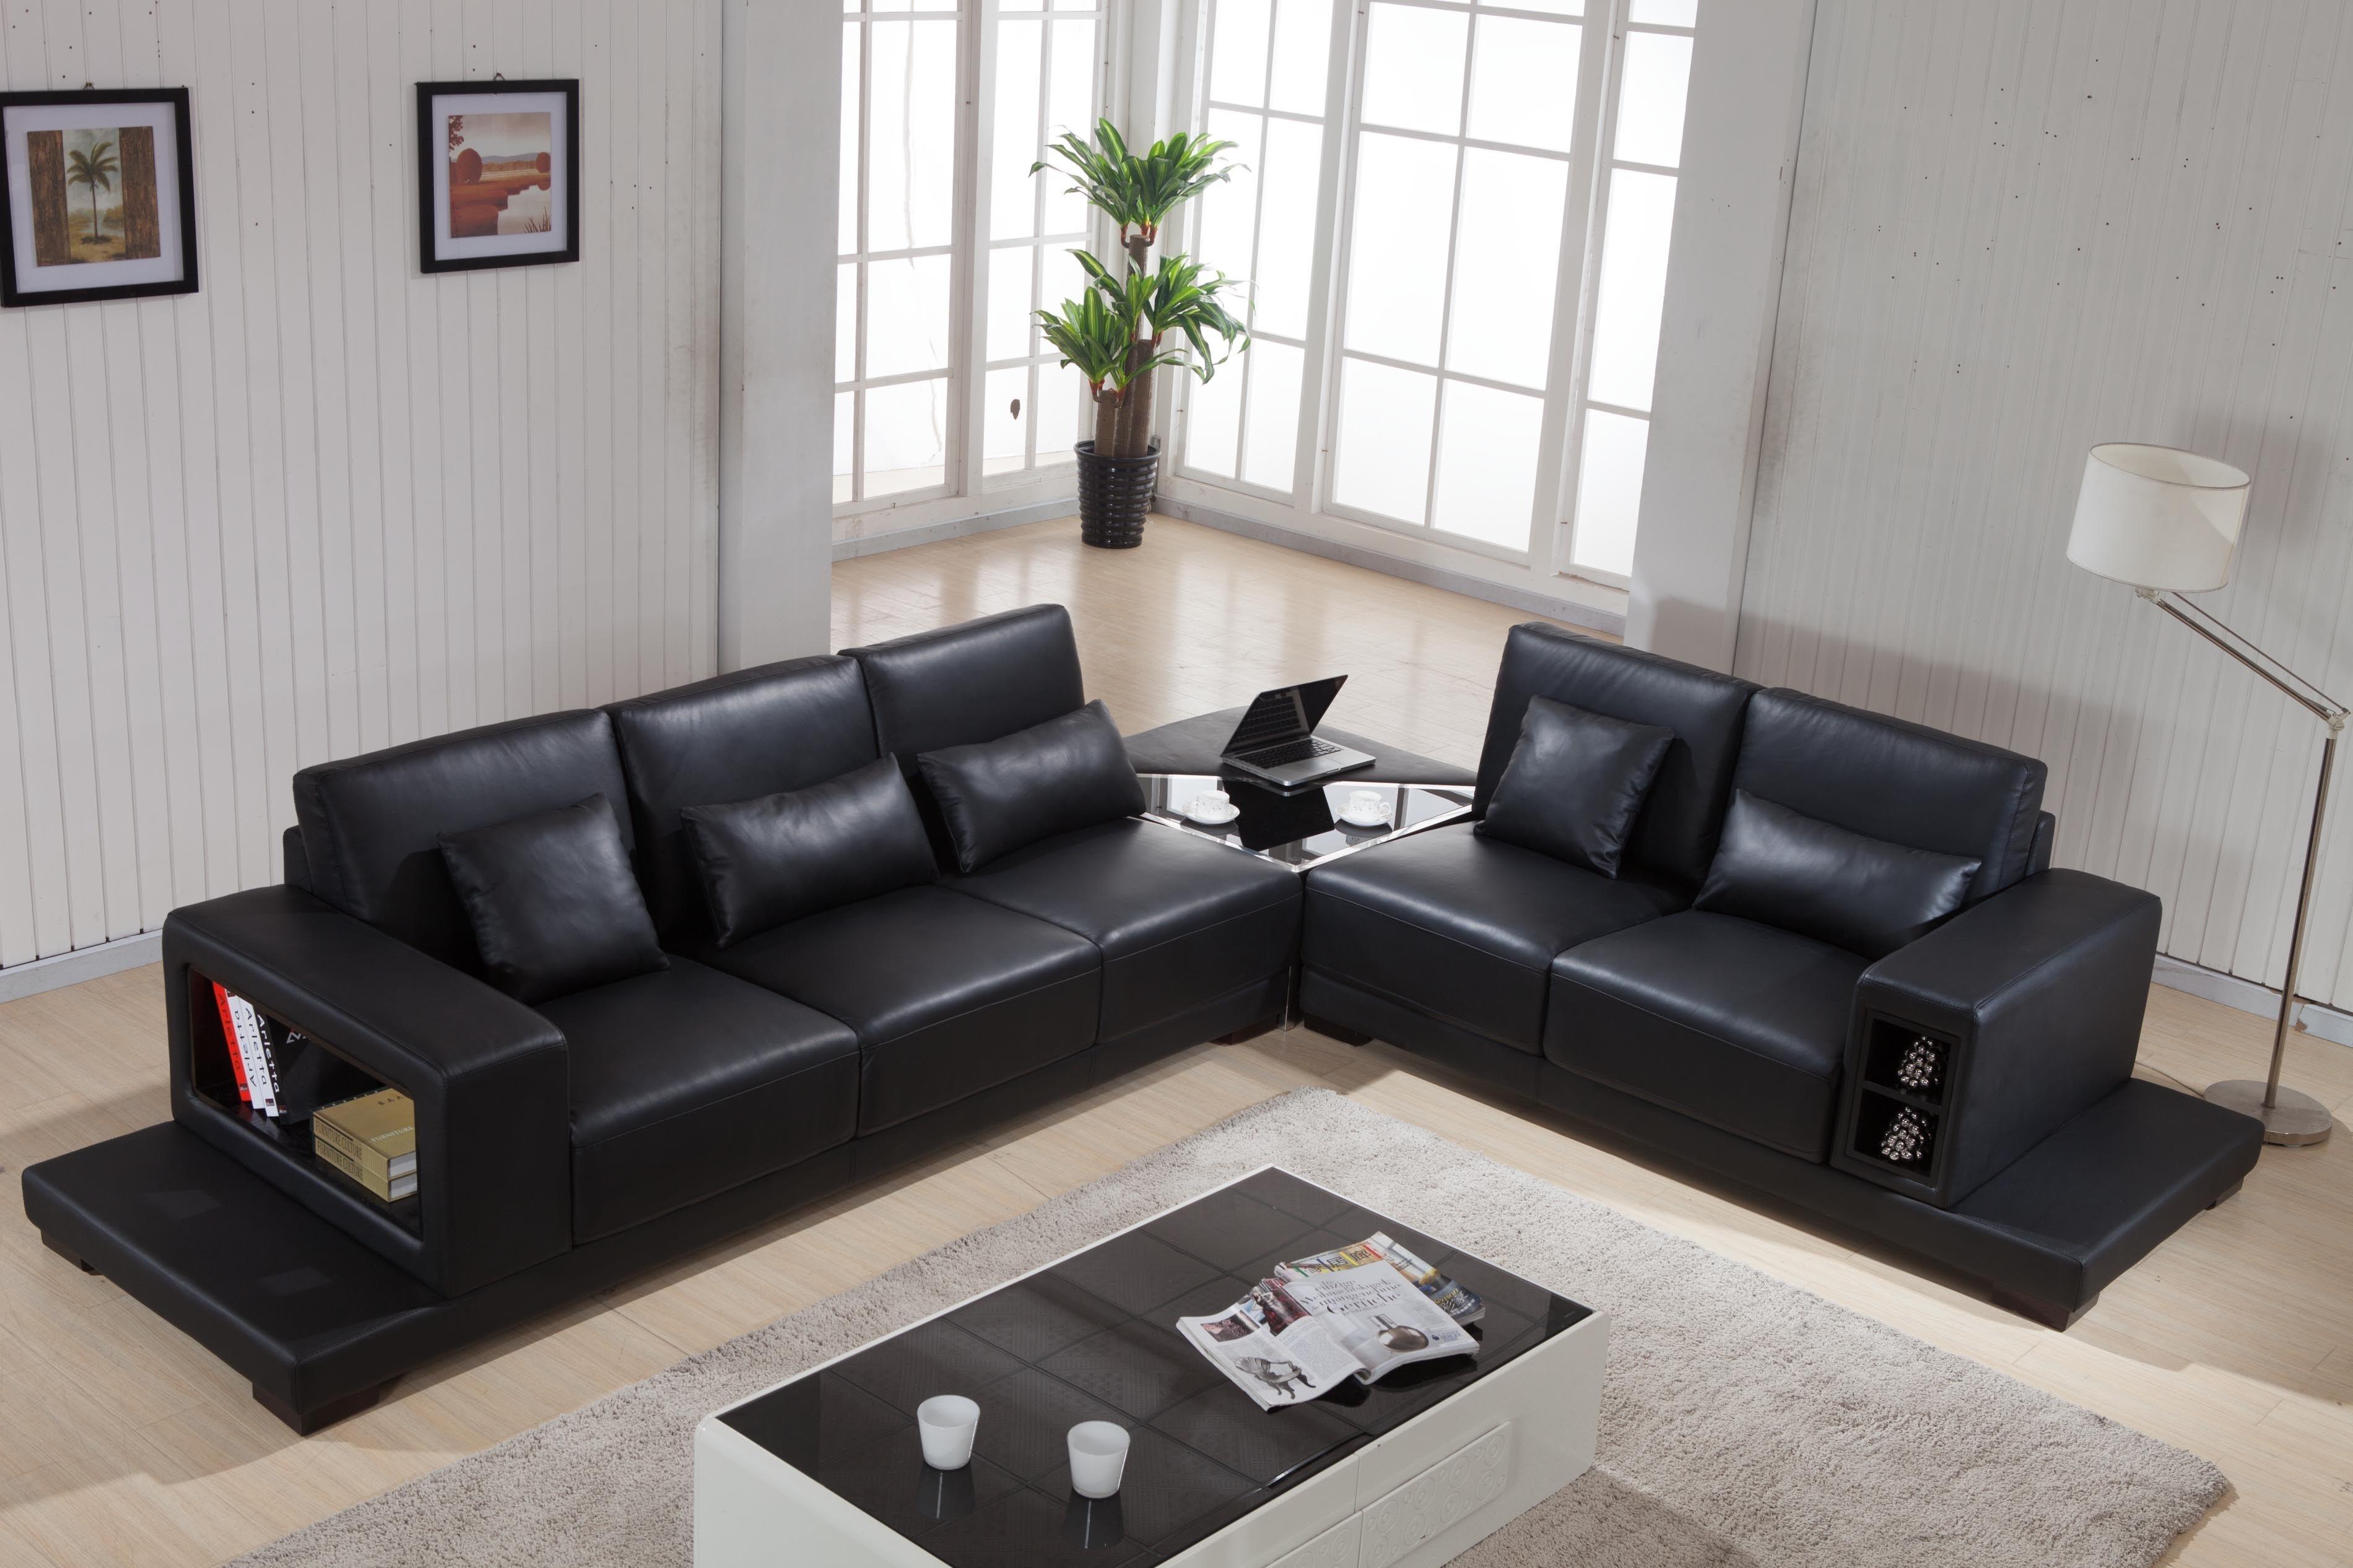 10 Lovable Leather Sofa Living Room Ideas leather sofa living room furniture ideas youtube 1 2021